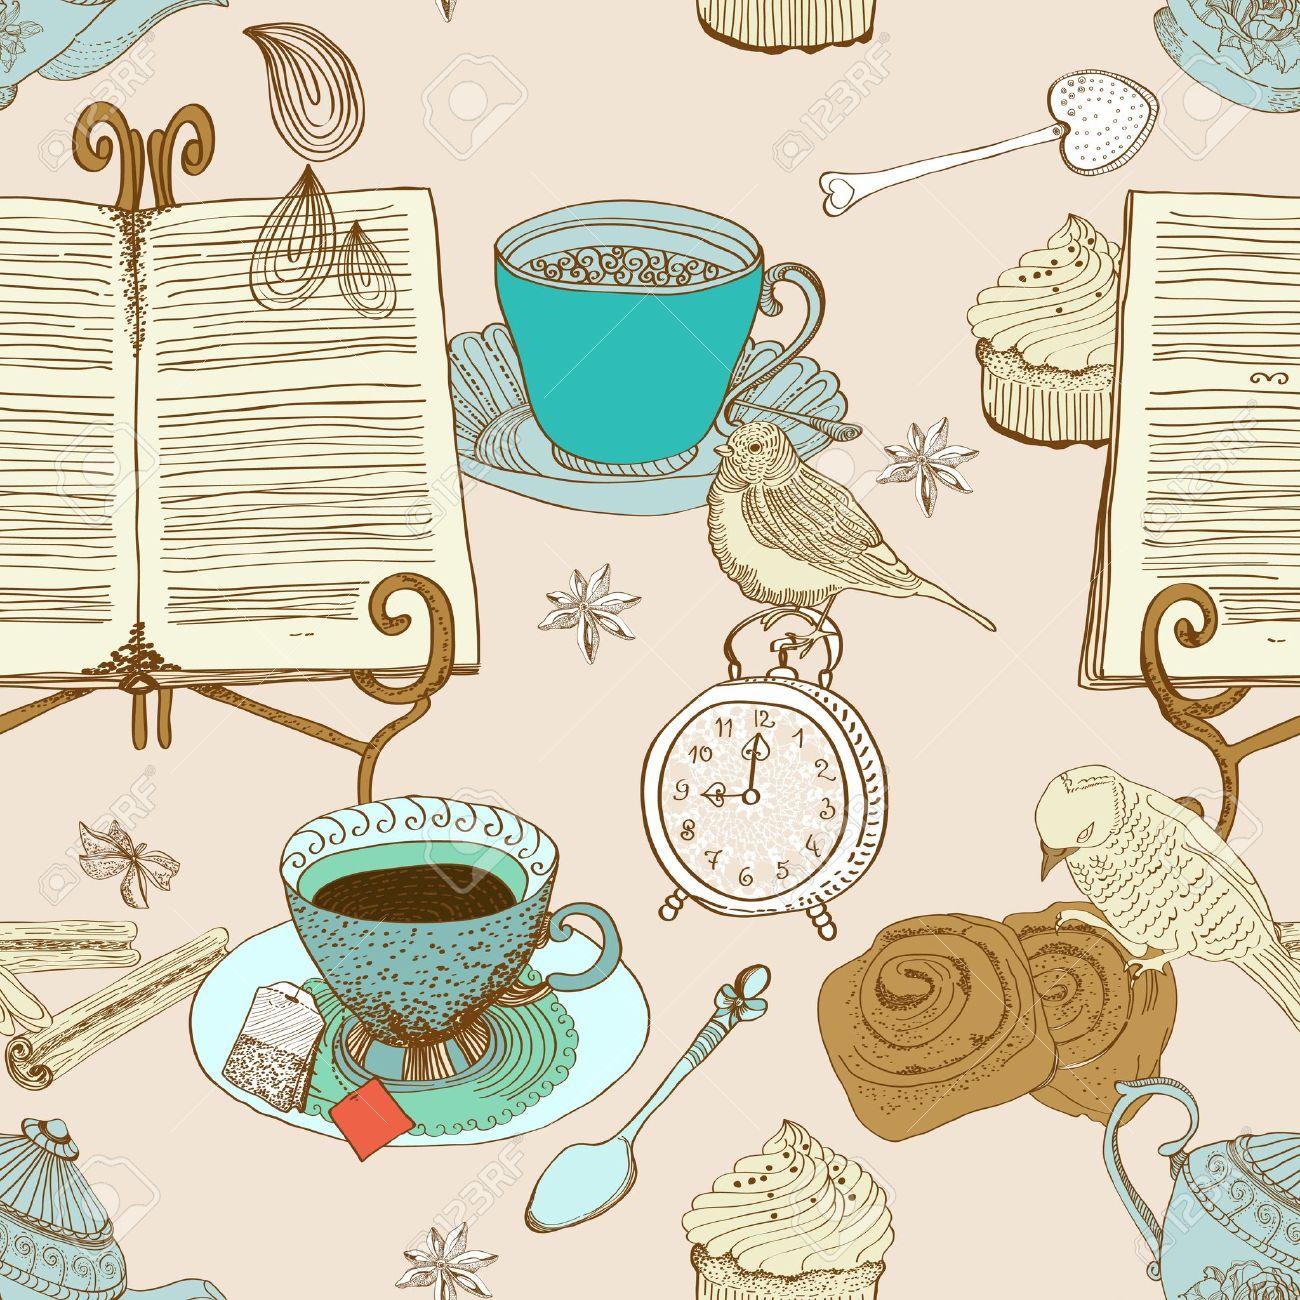 vintage morning tea background  seamless pattern for design, illustration Stock Vector - 15775003